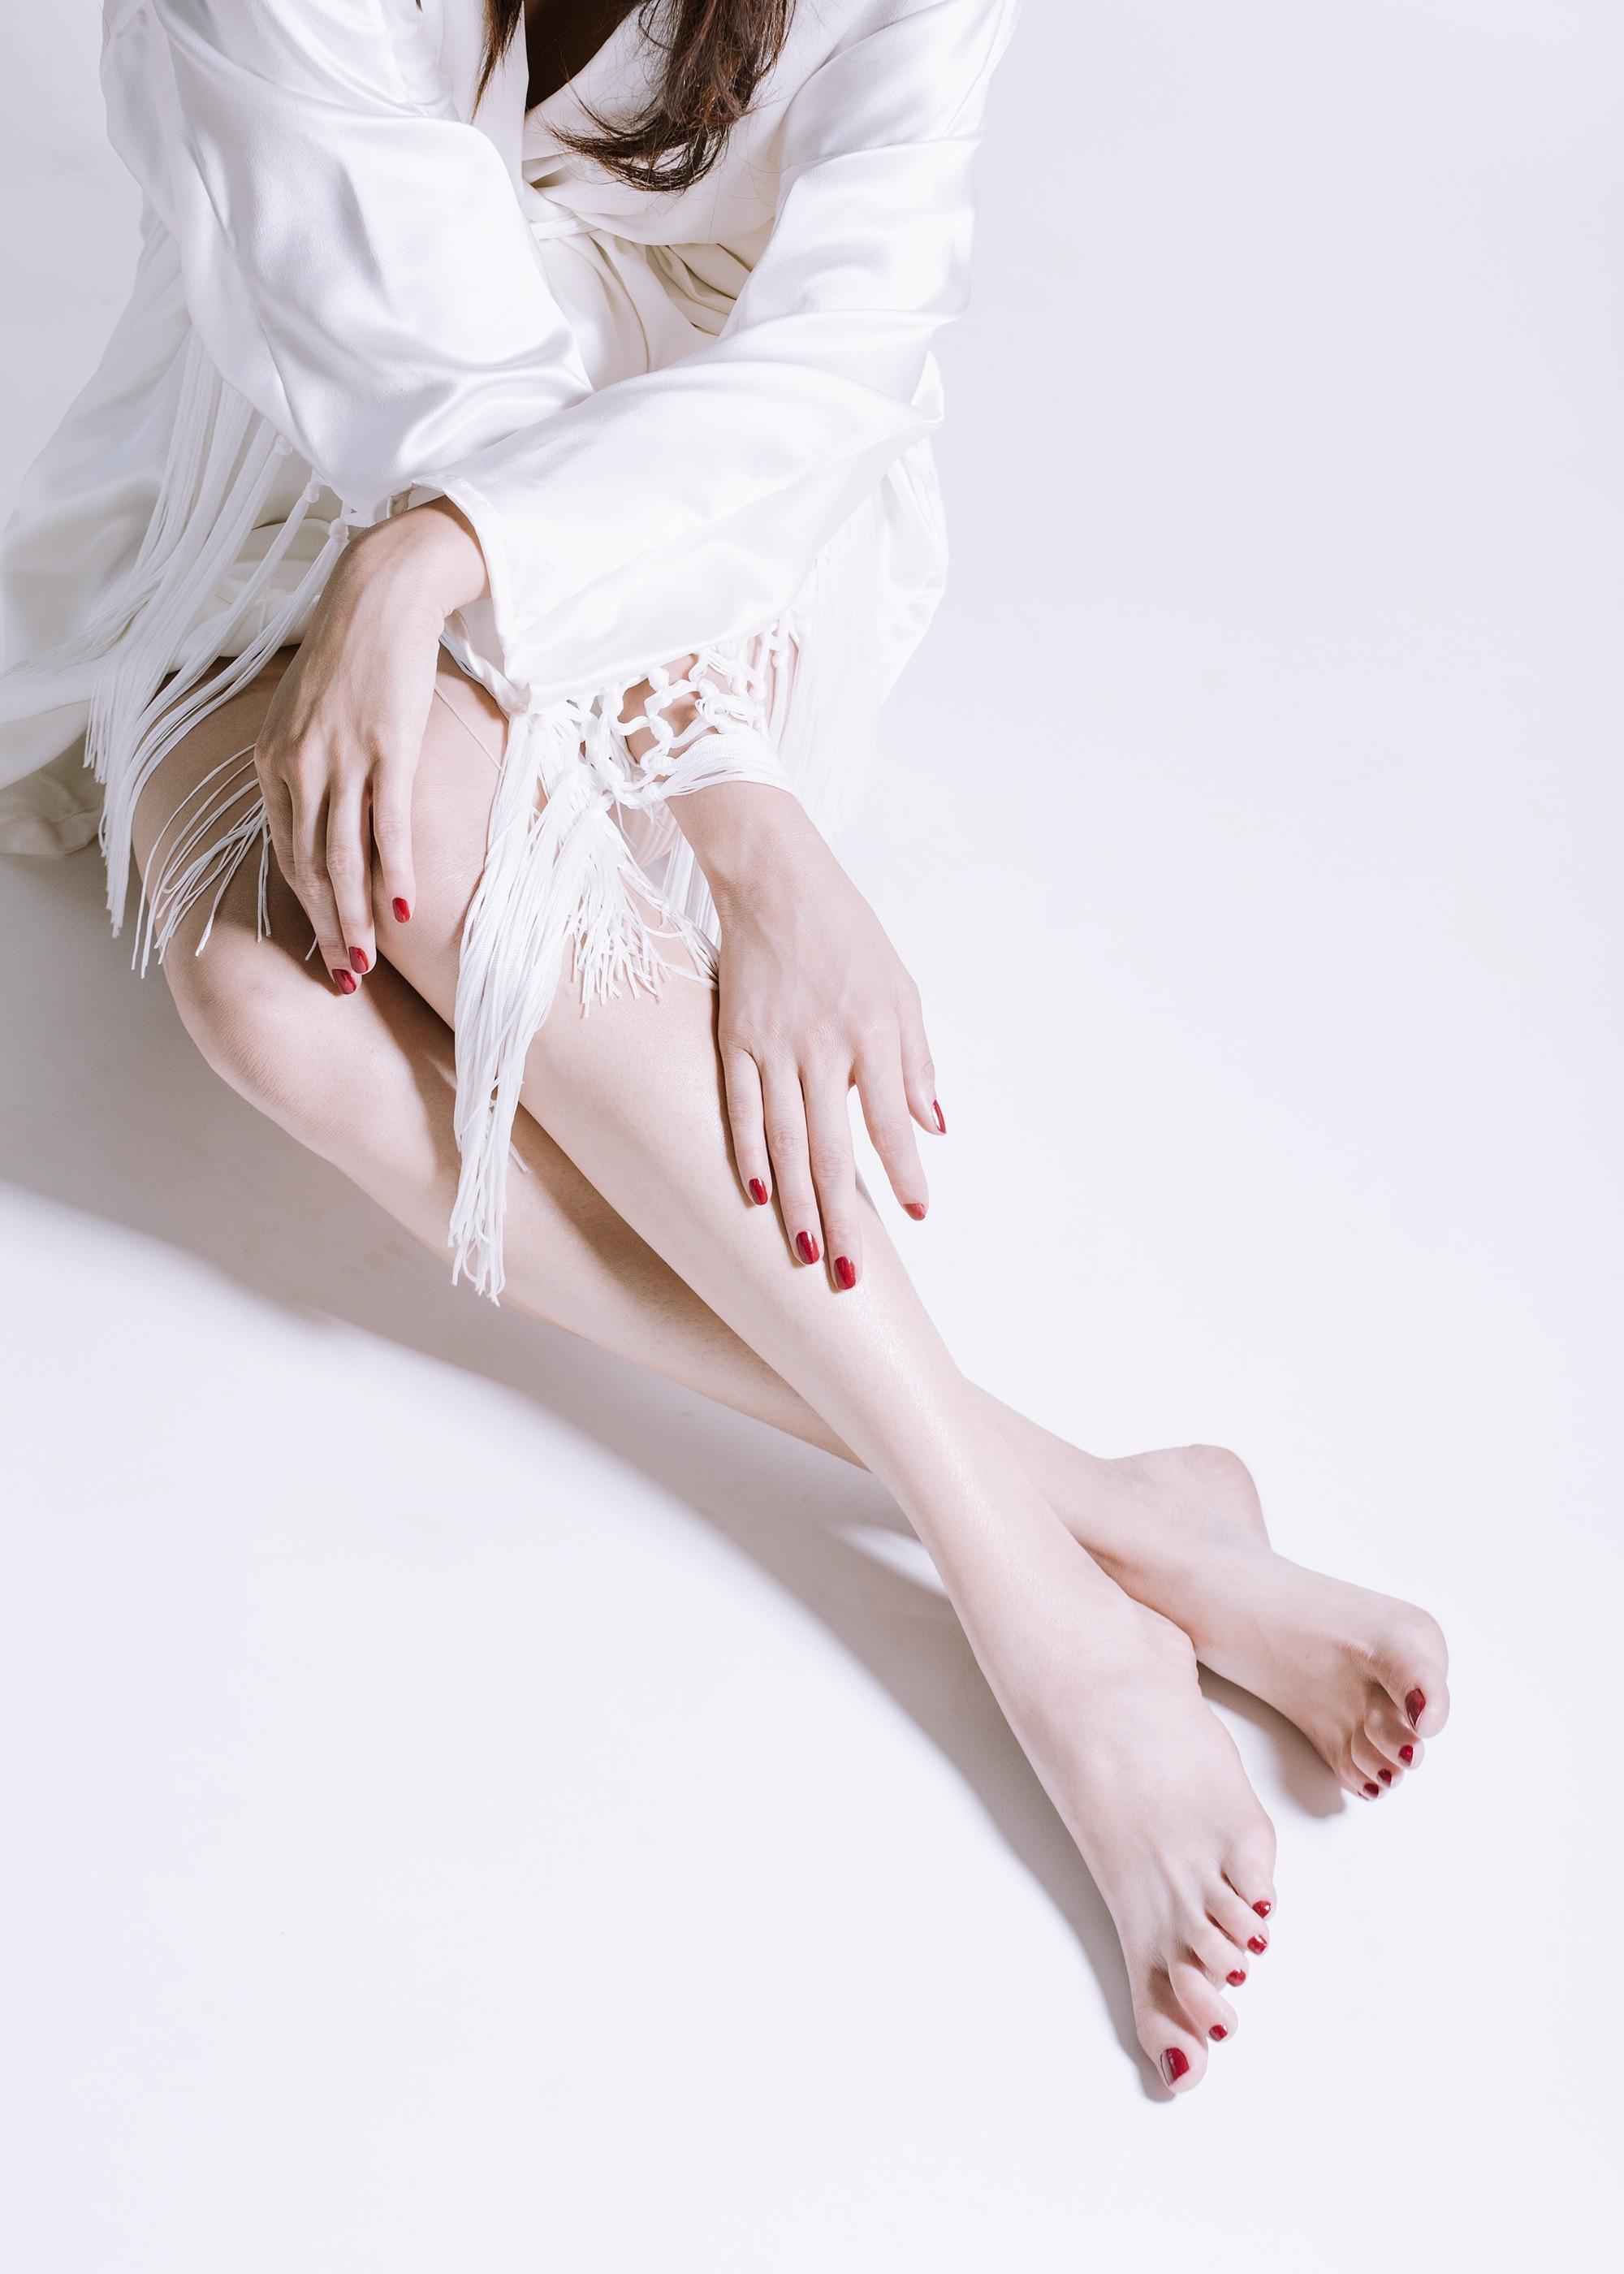 sophia-feliciano_feet2